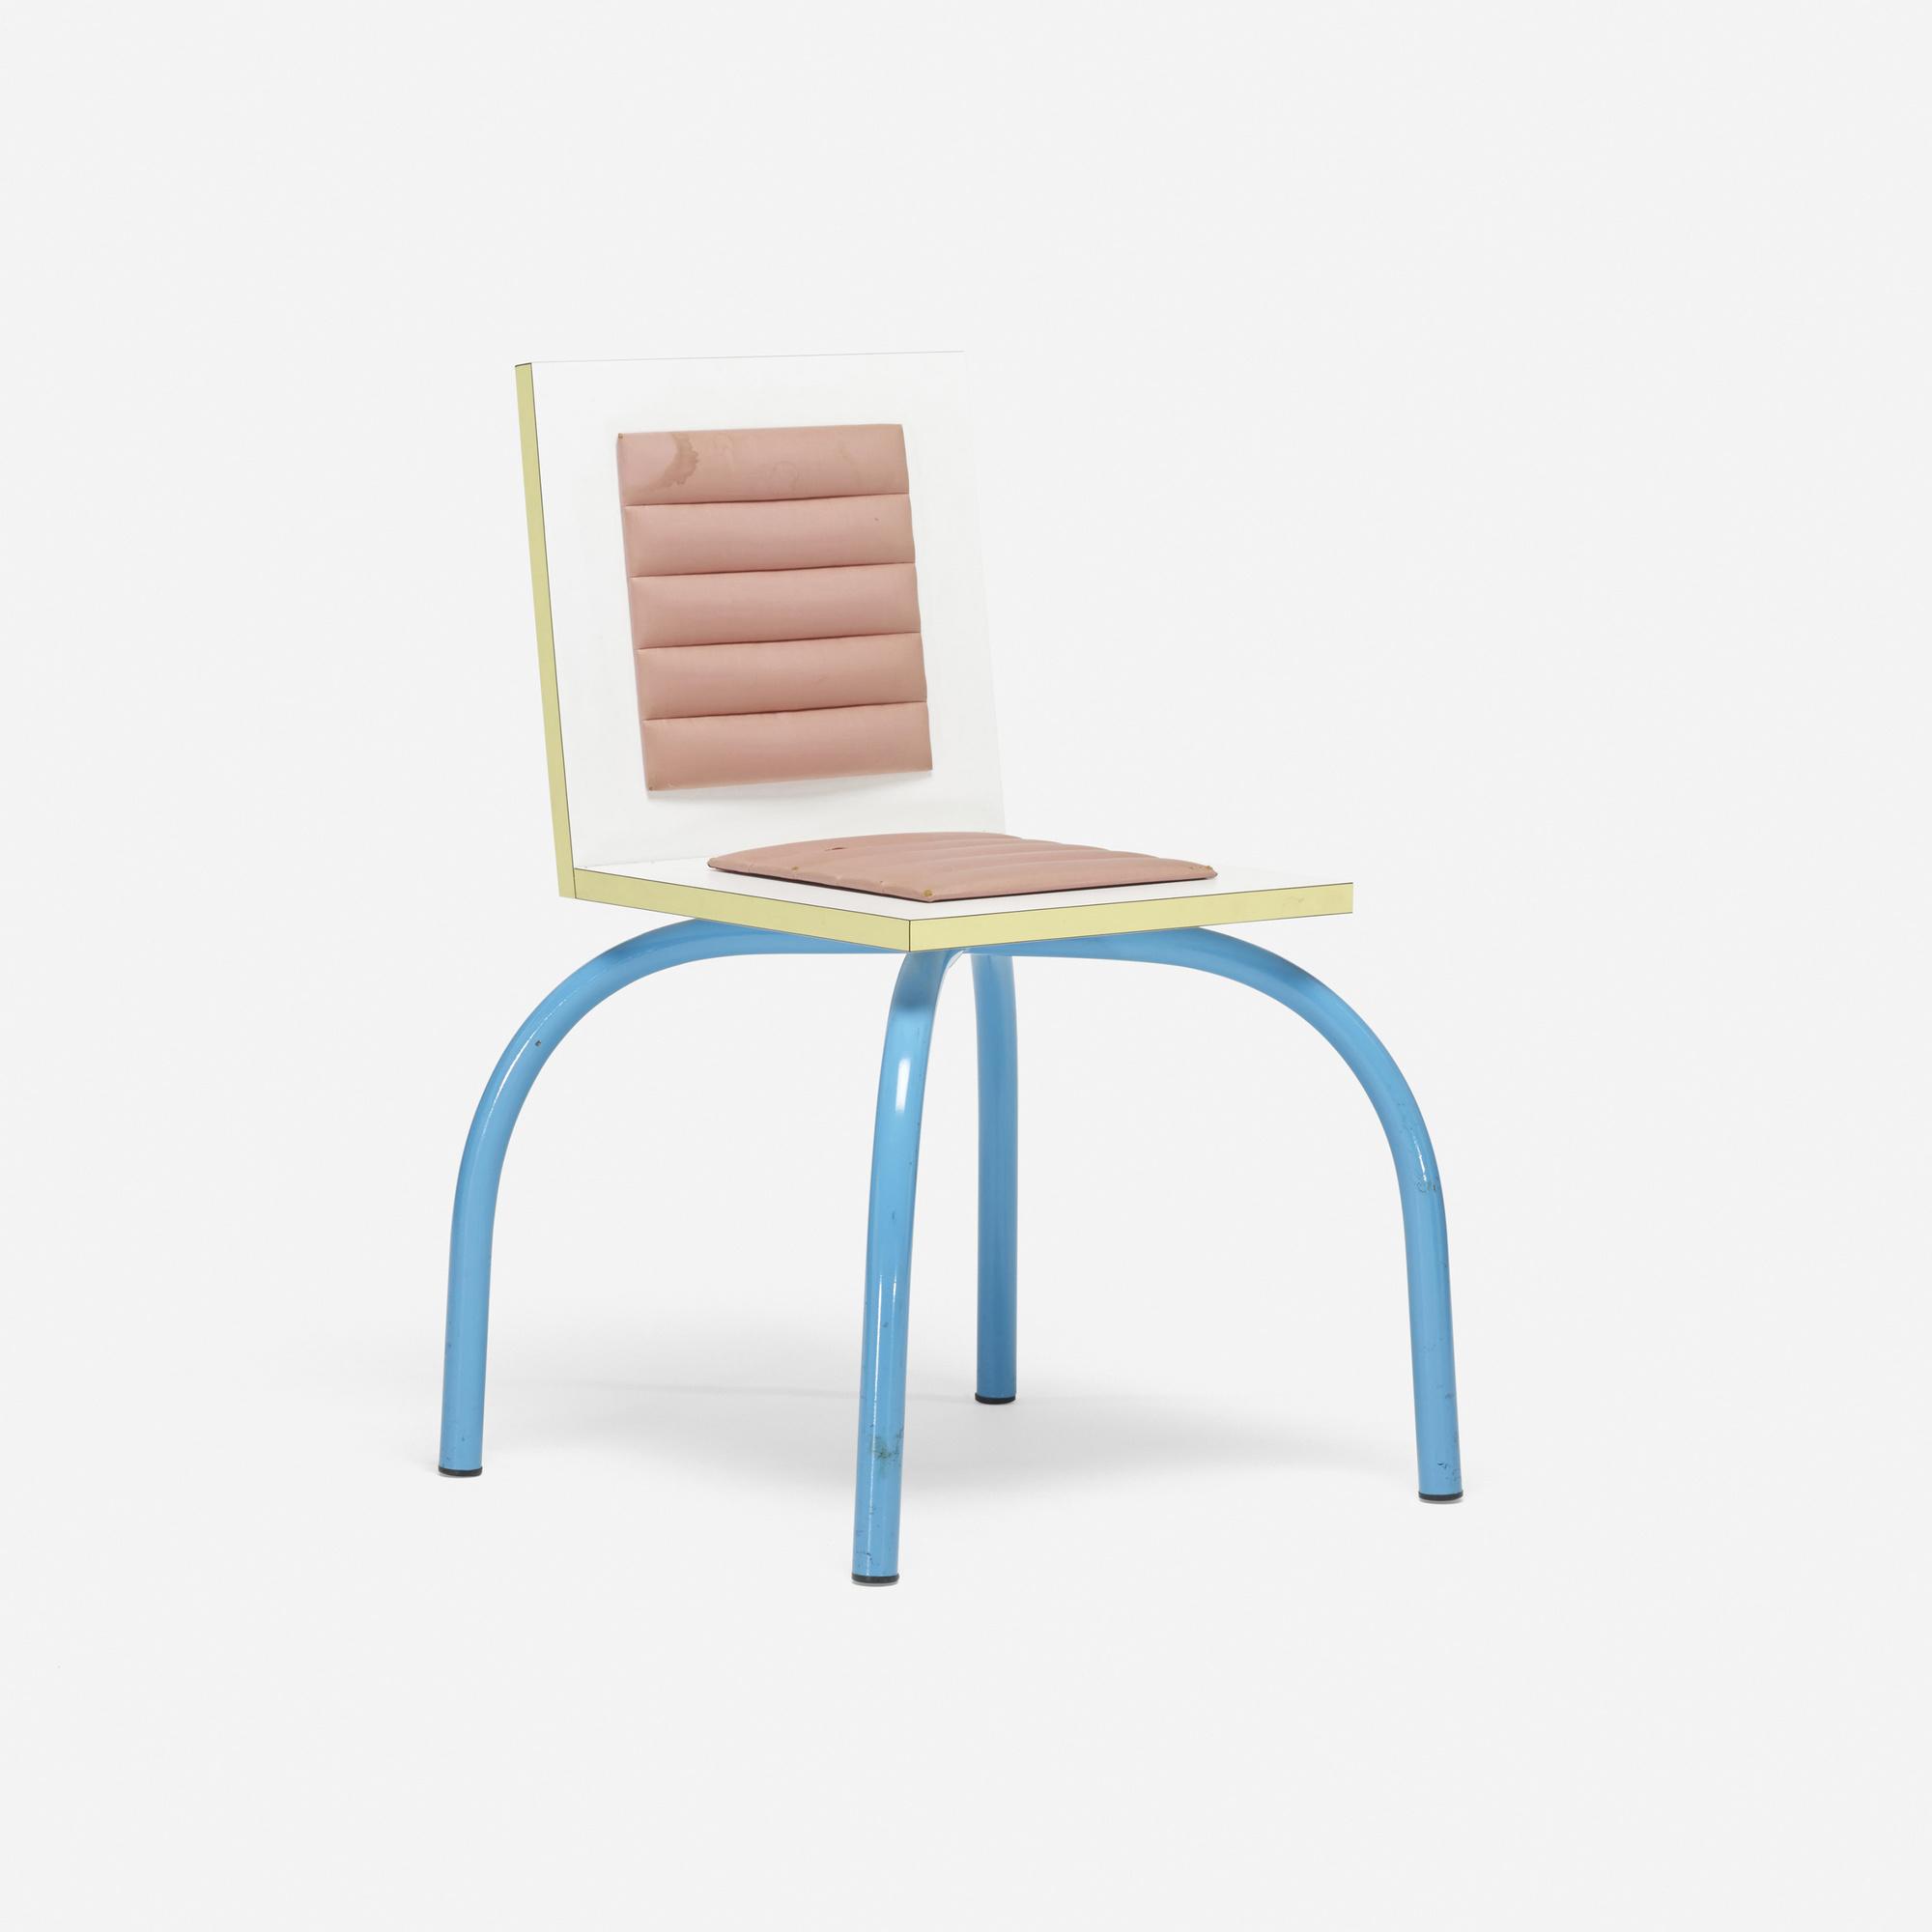 458 michele de lucchi riviera chair for Chair design 2000